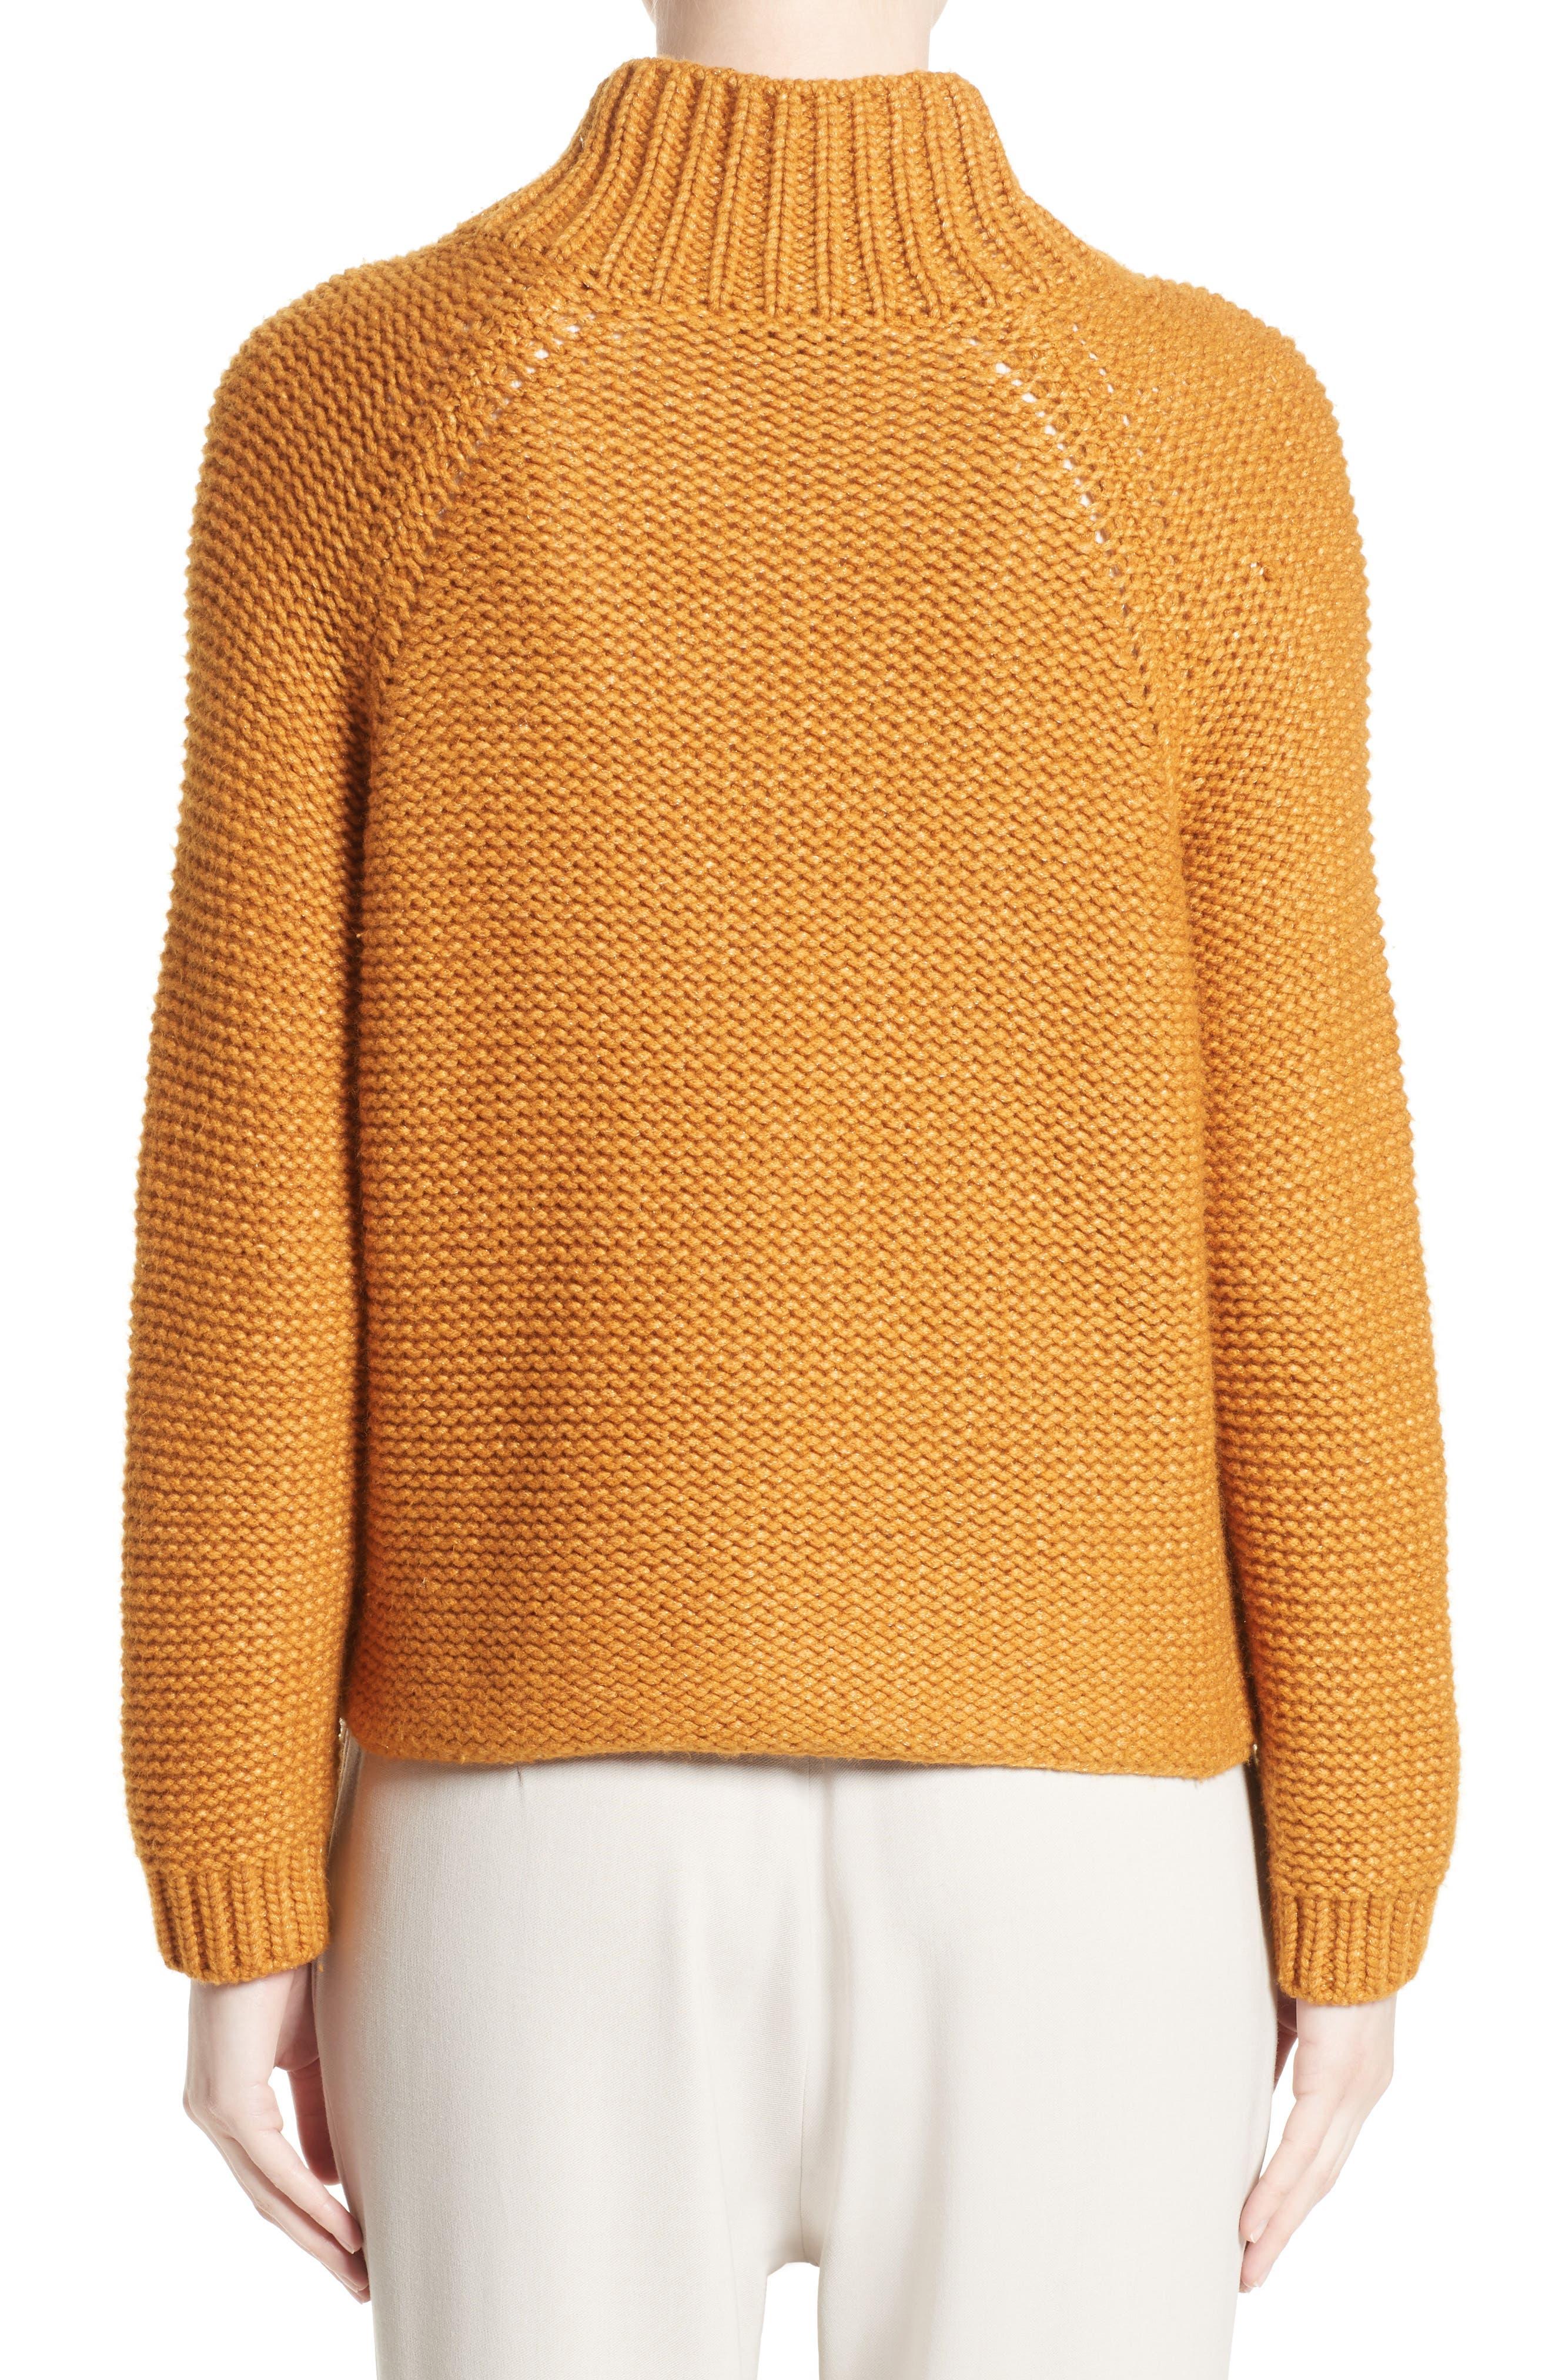 Knit Wool Blend Cardigan,                             Alternate thumbnail 2, color,                             Amber